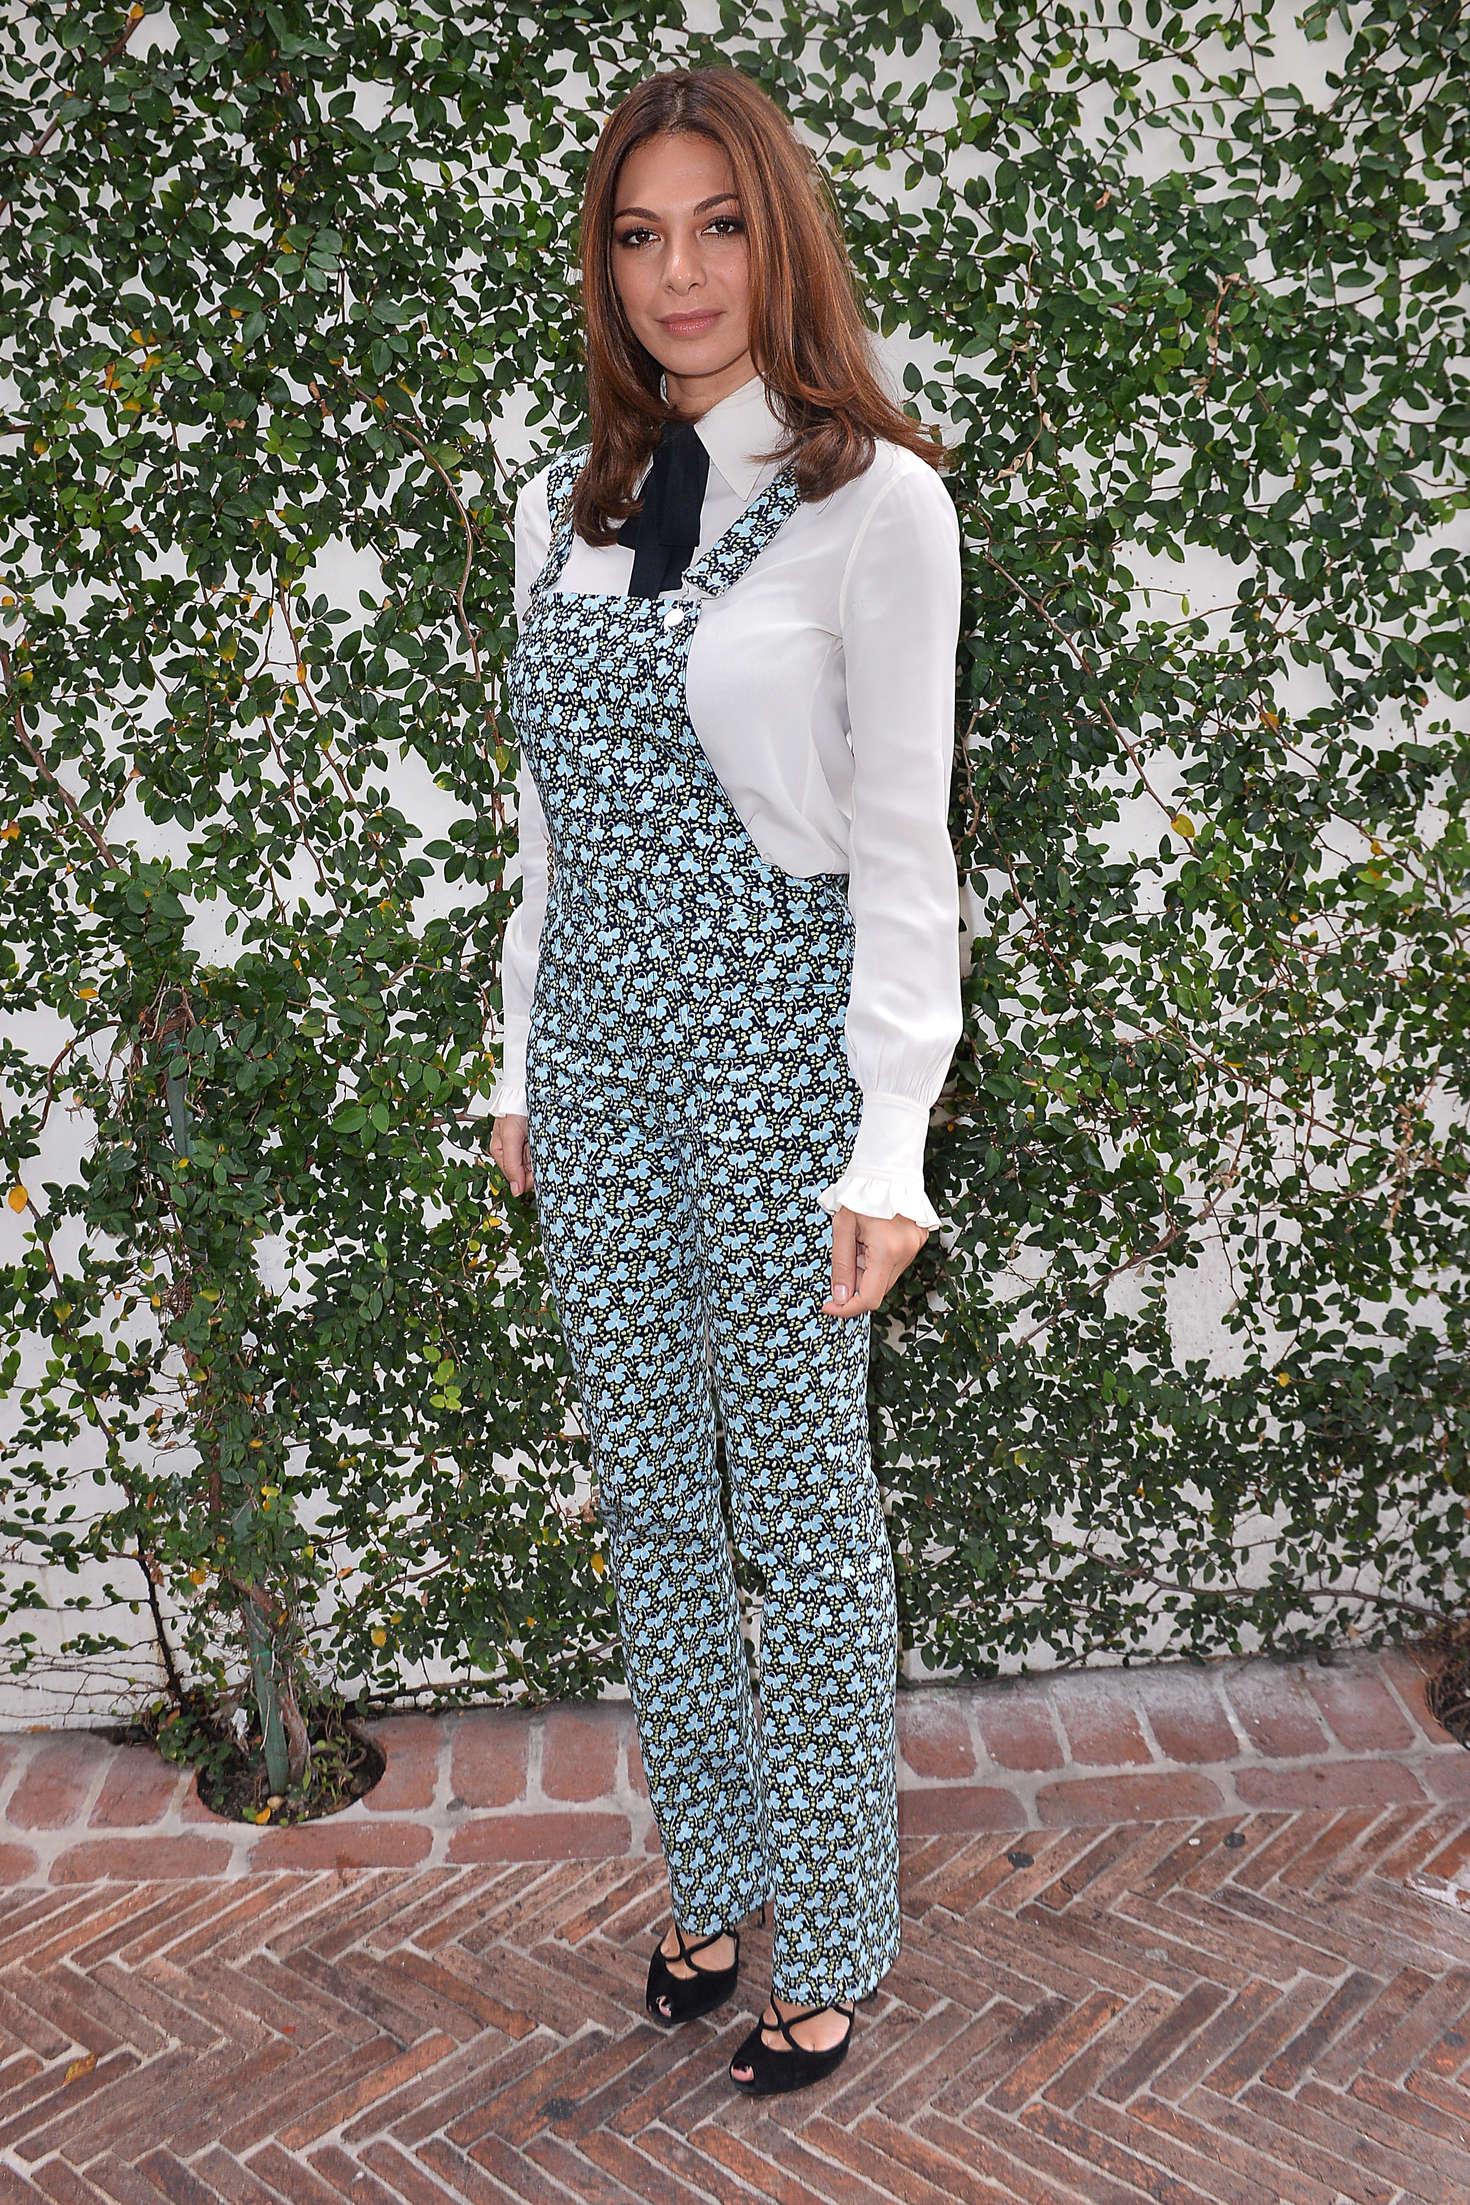 Moran Atias W Magazines It Girl Luncheon in Los Angeles